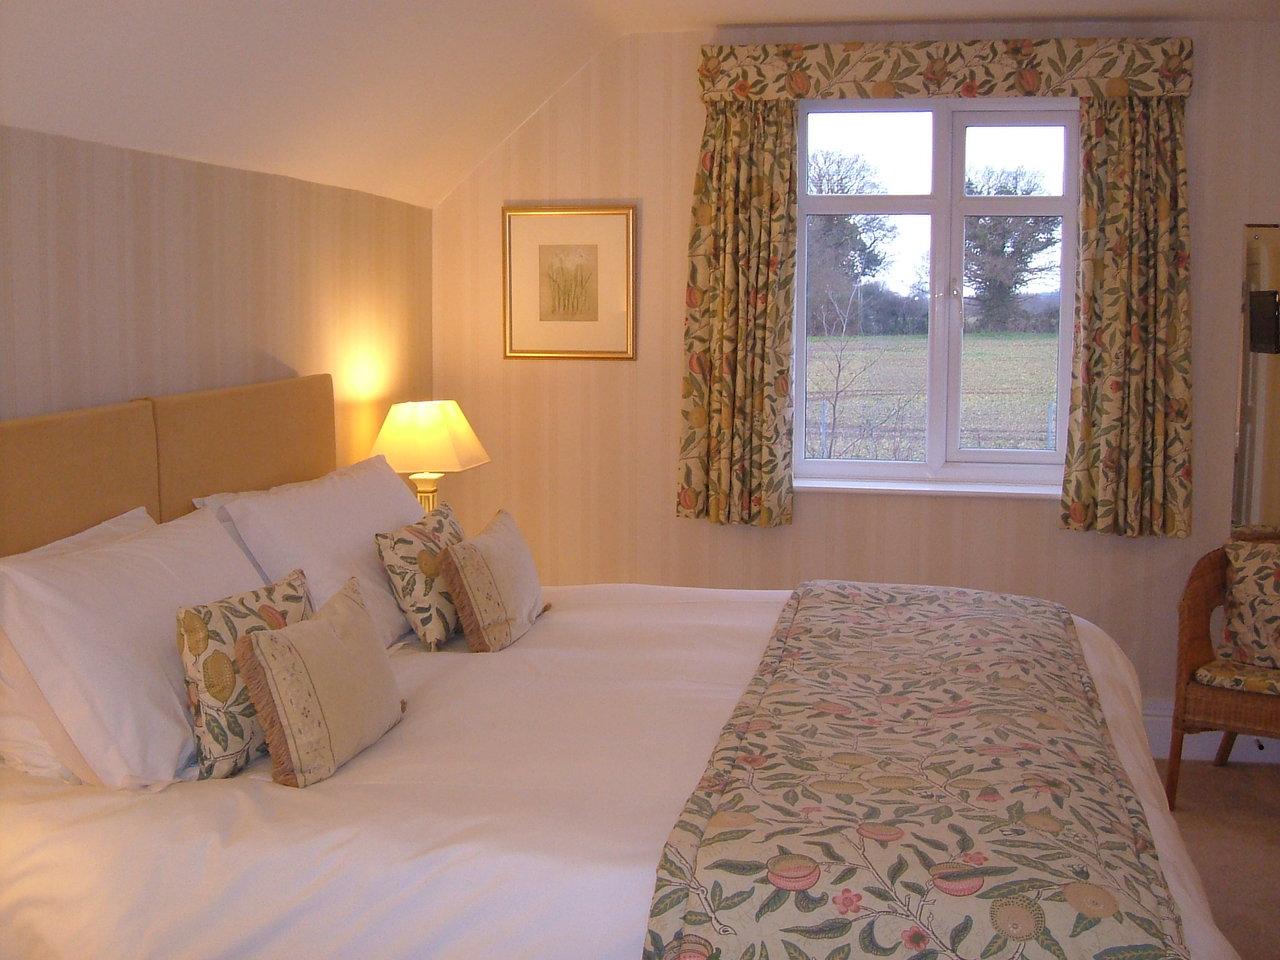 Hereford bedroom